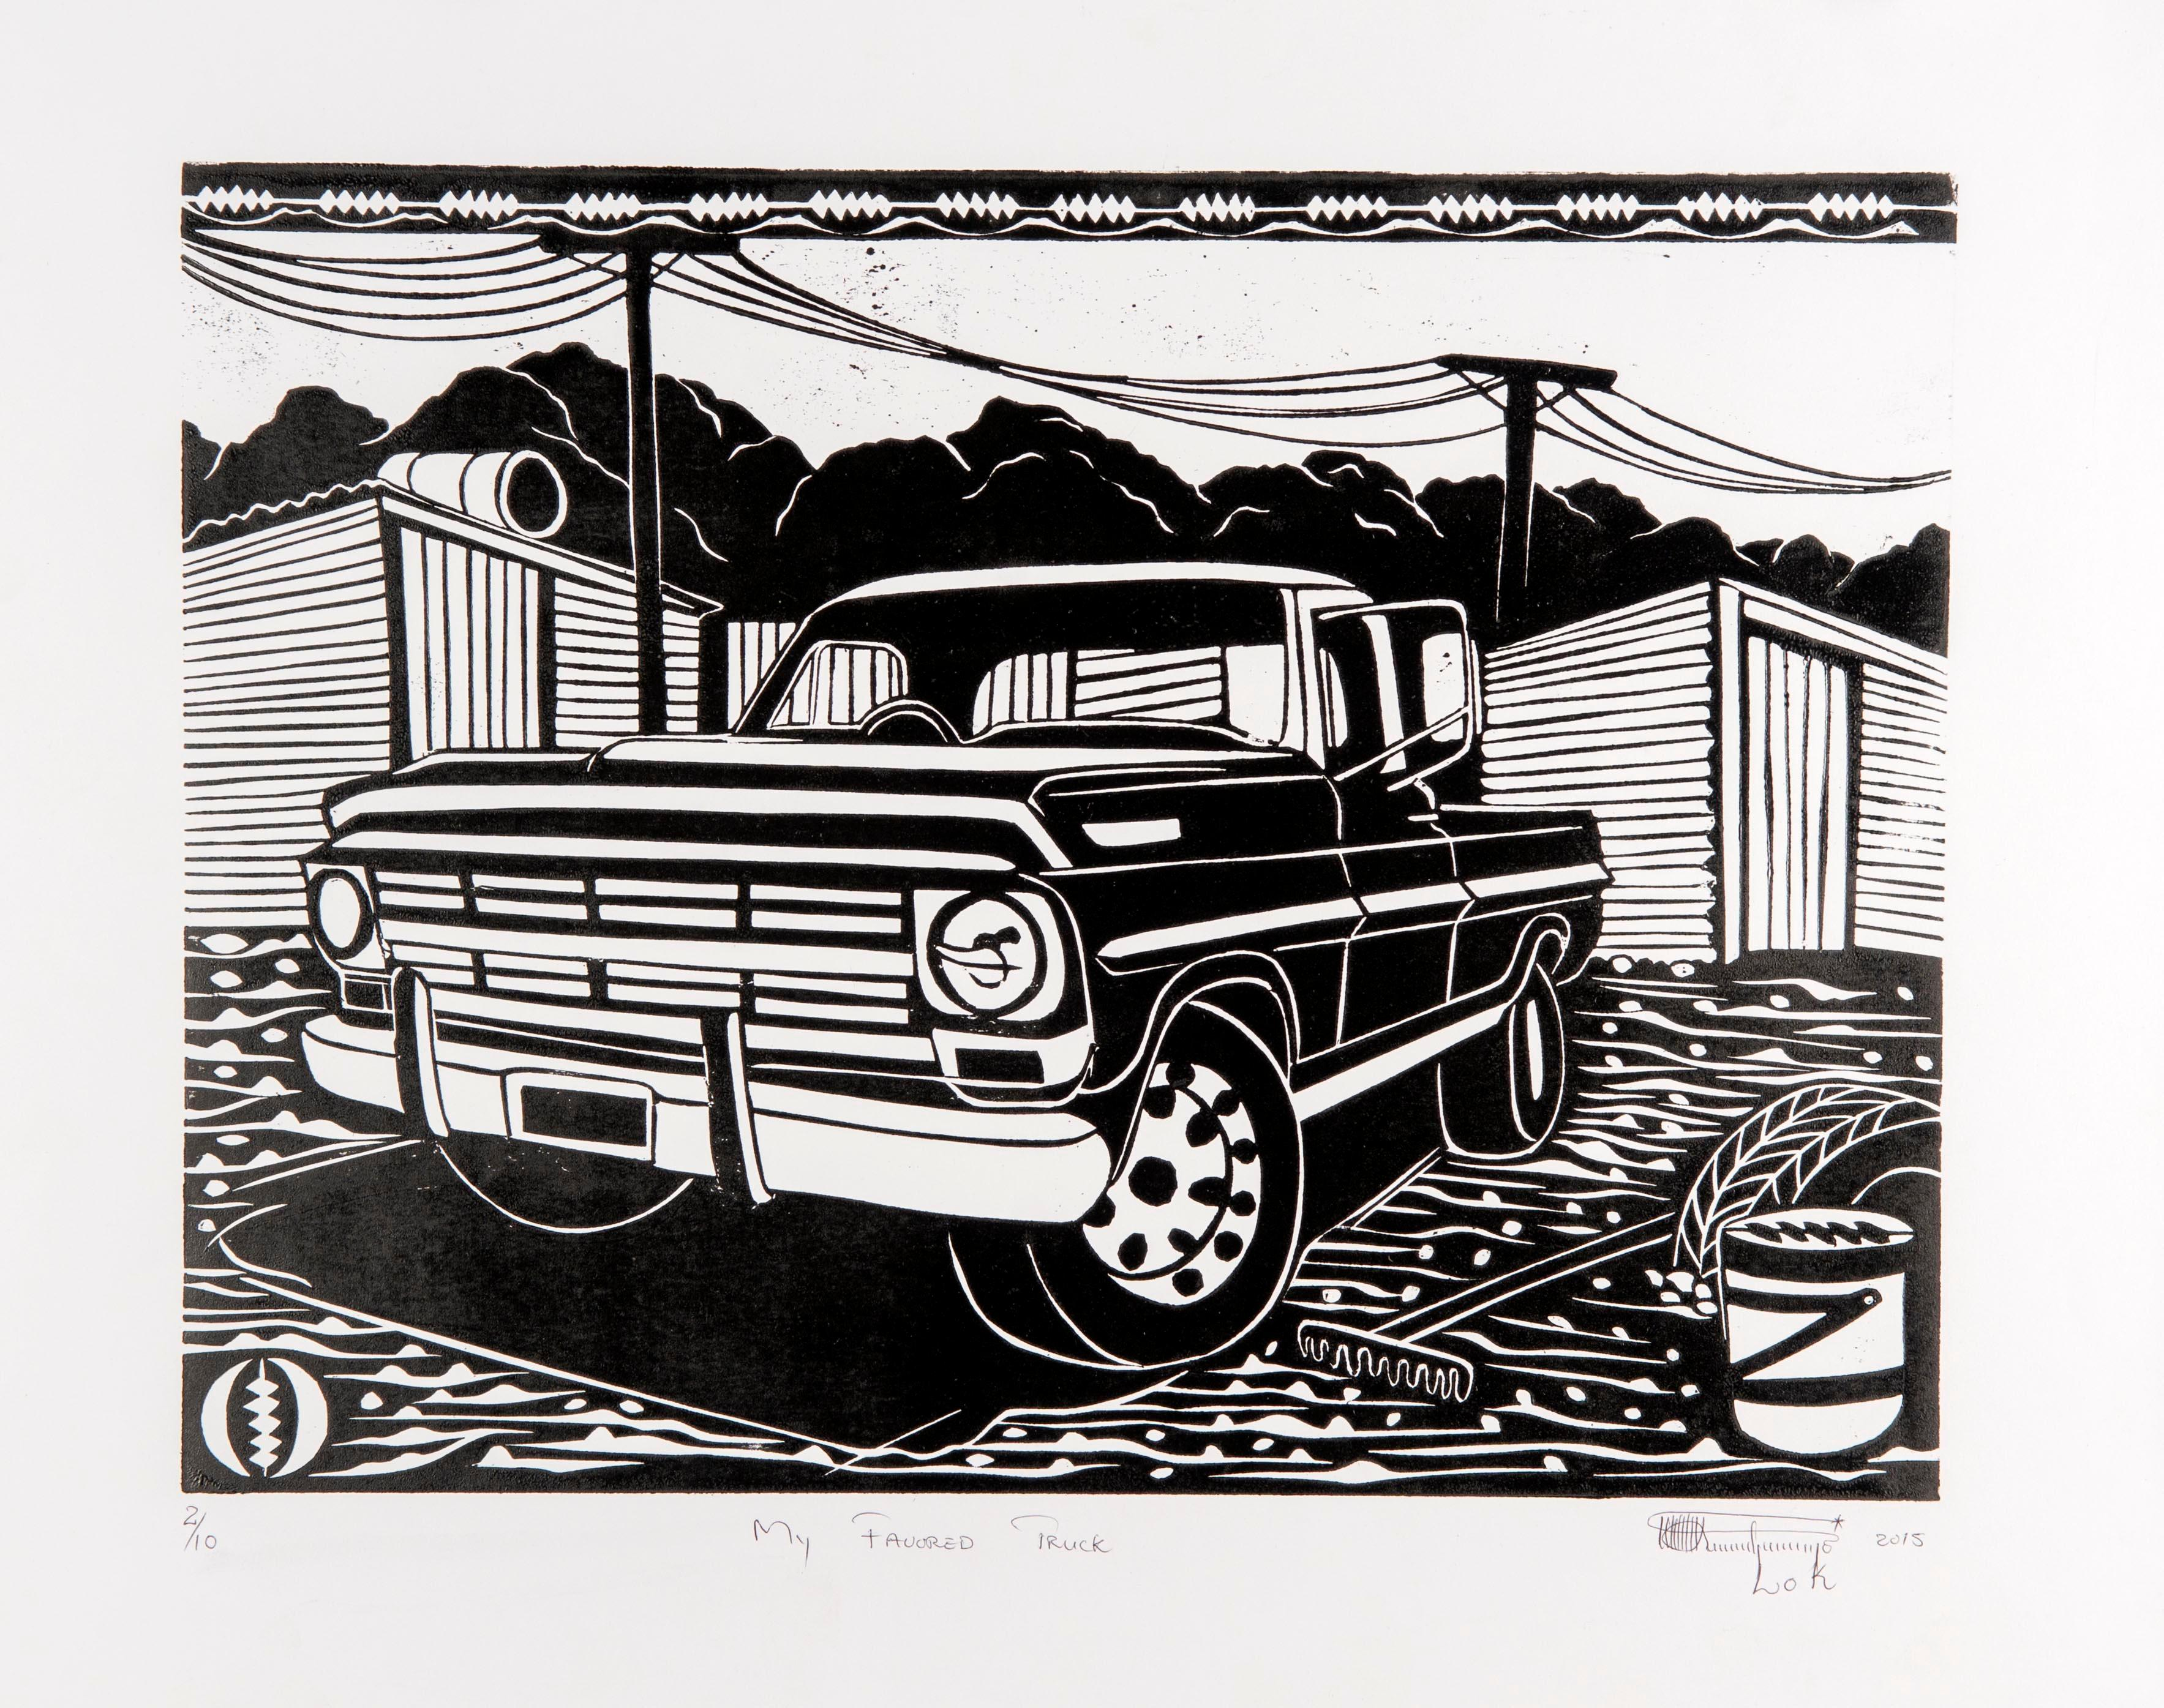 My Favored Truck. Linoleum Block Print on Paper. 2/10